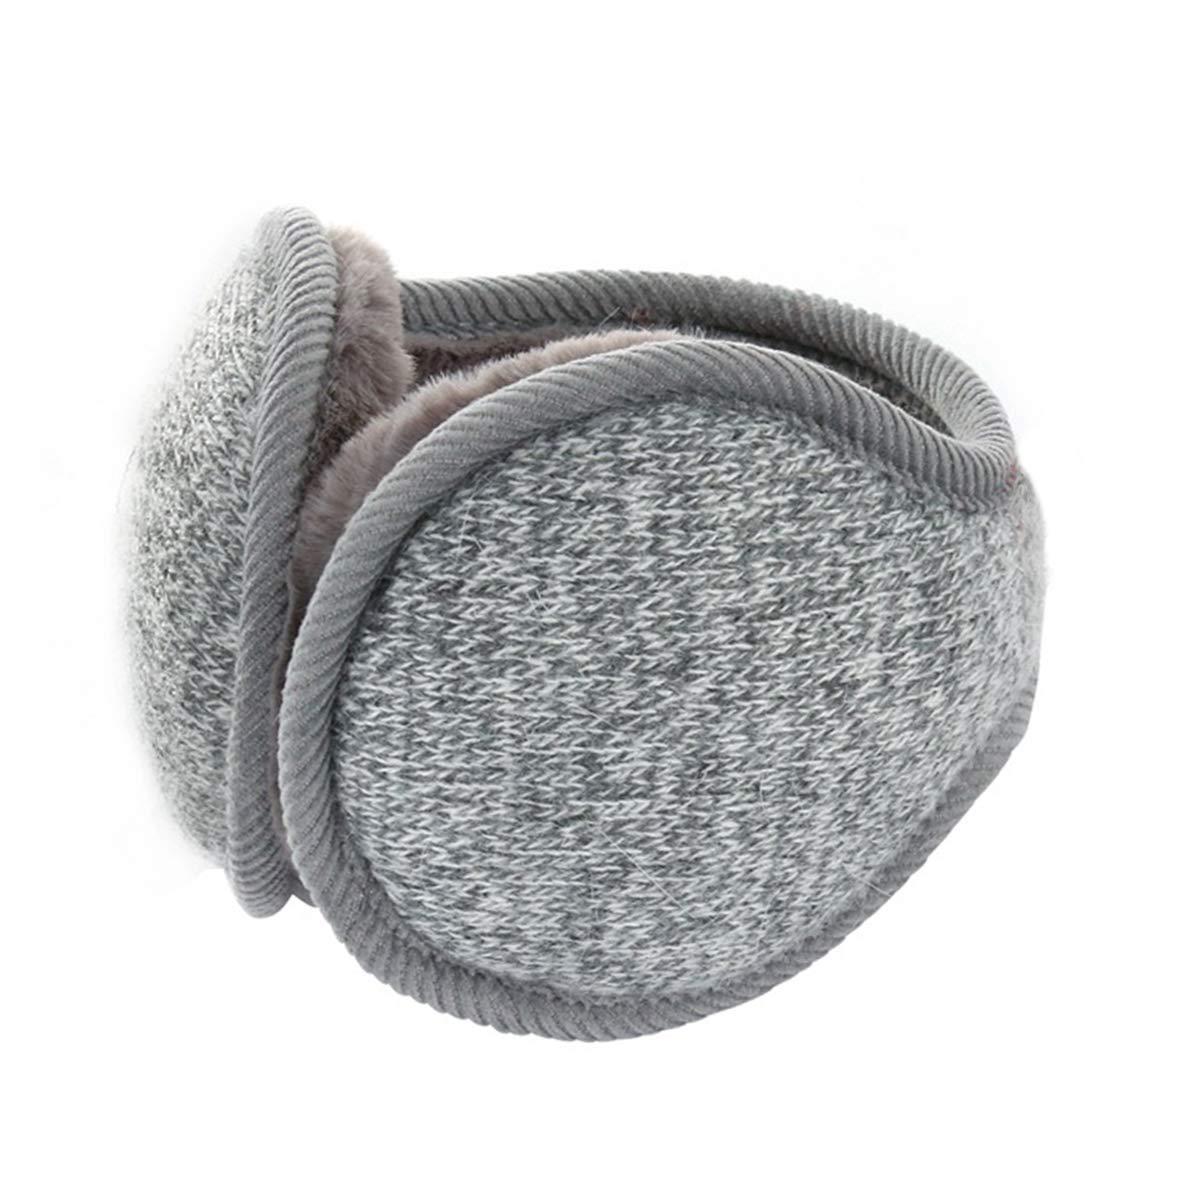 Poemay Winter Outdoor EarMuffs Earwarmer Unisex Fluffy Ear Cover Foldable